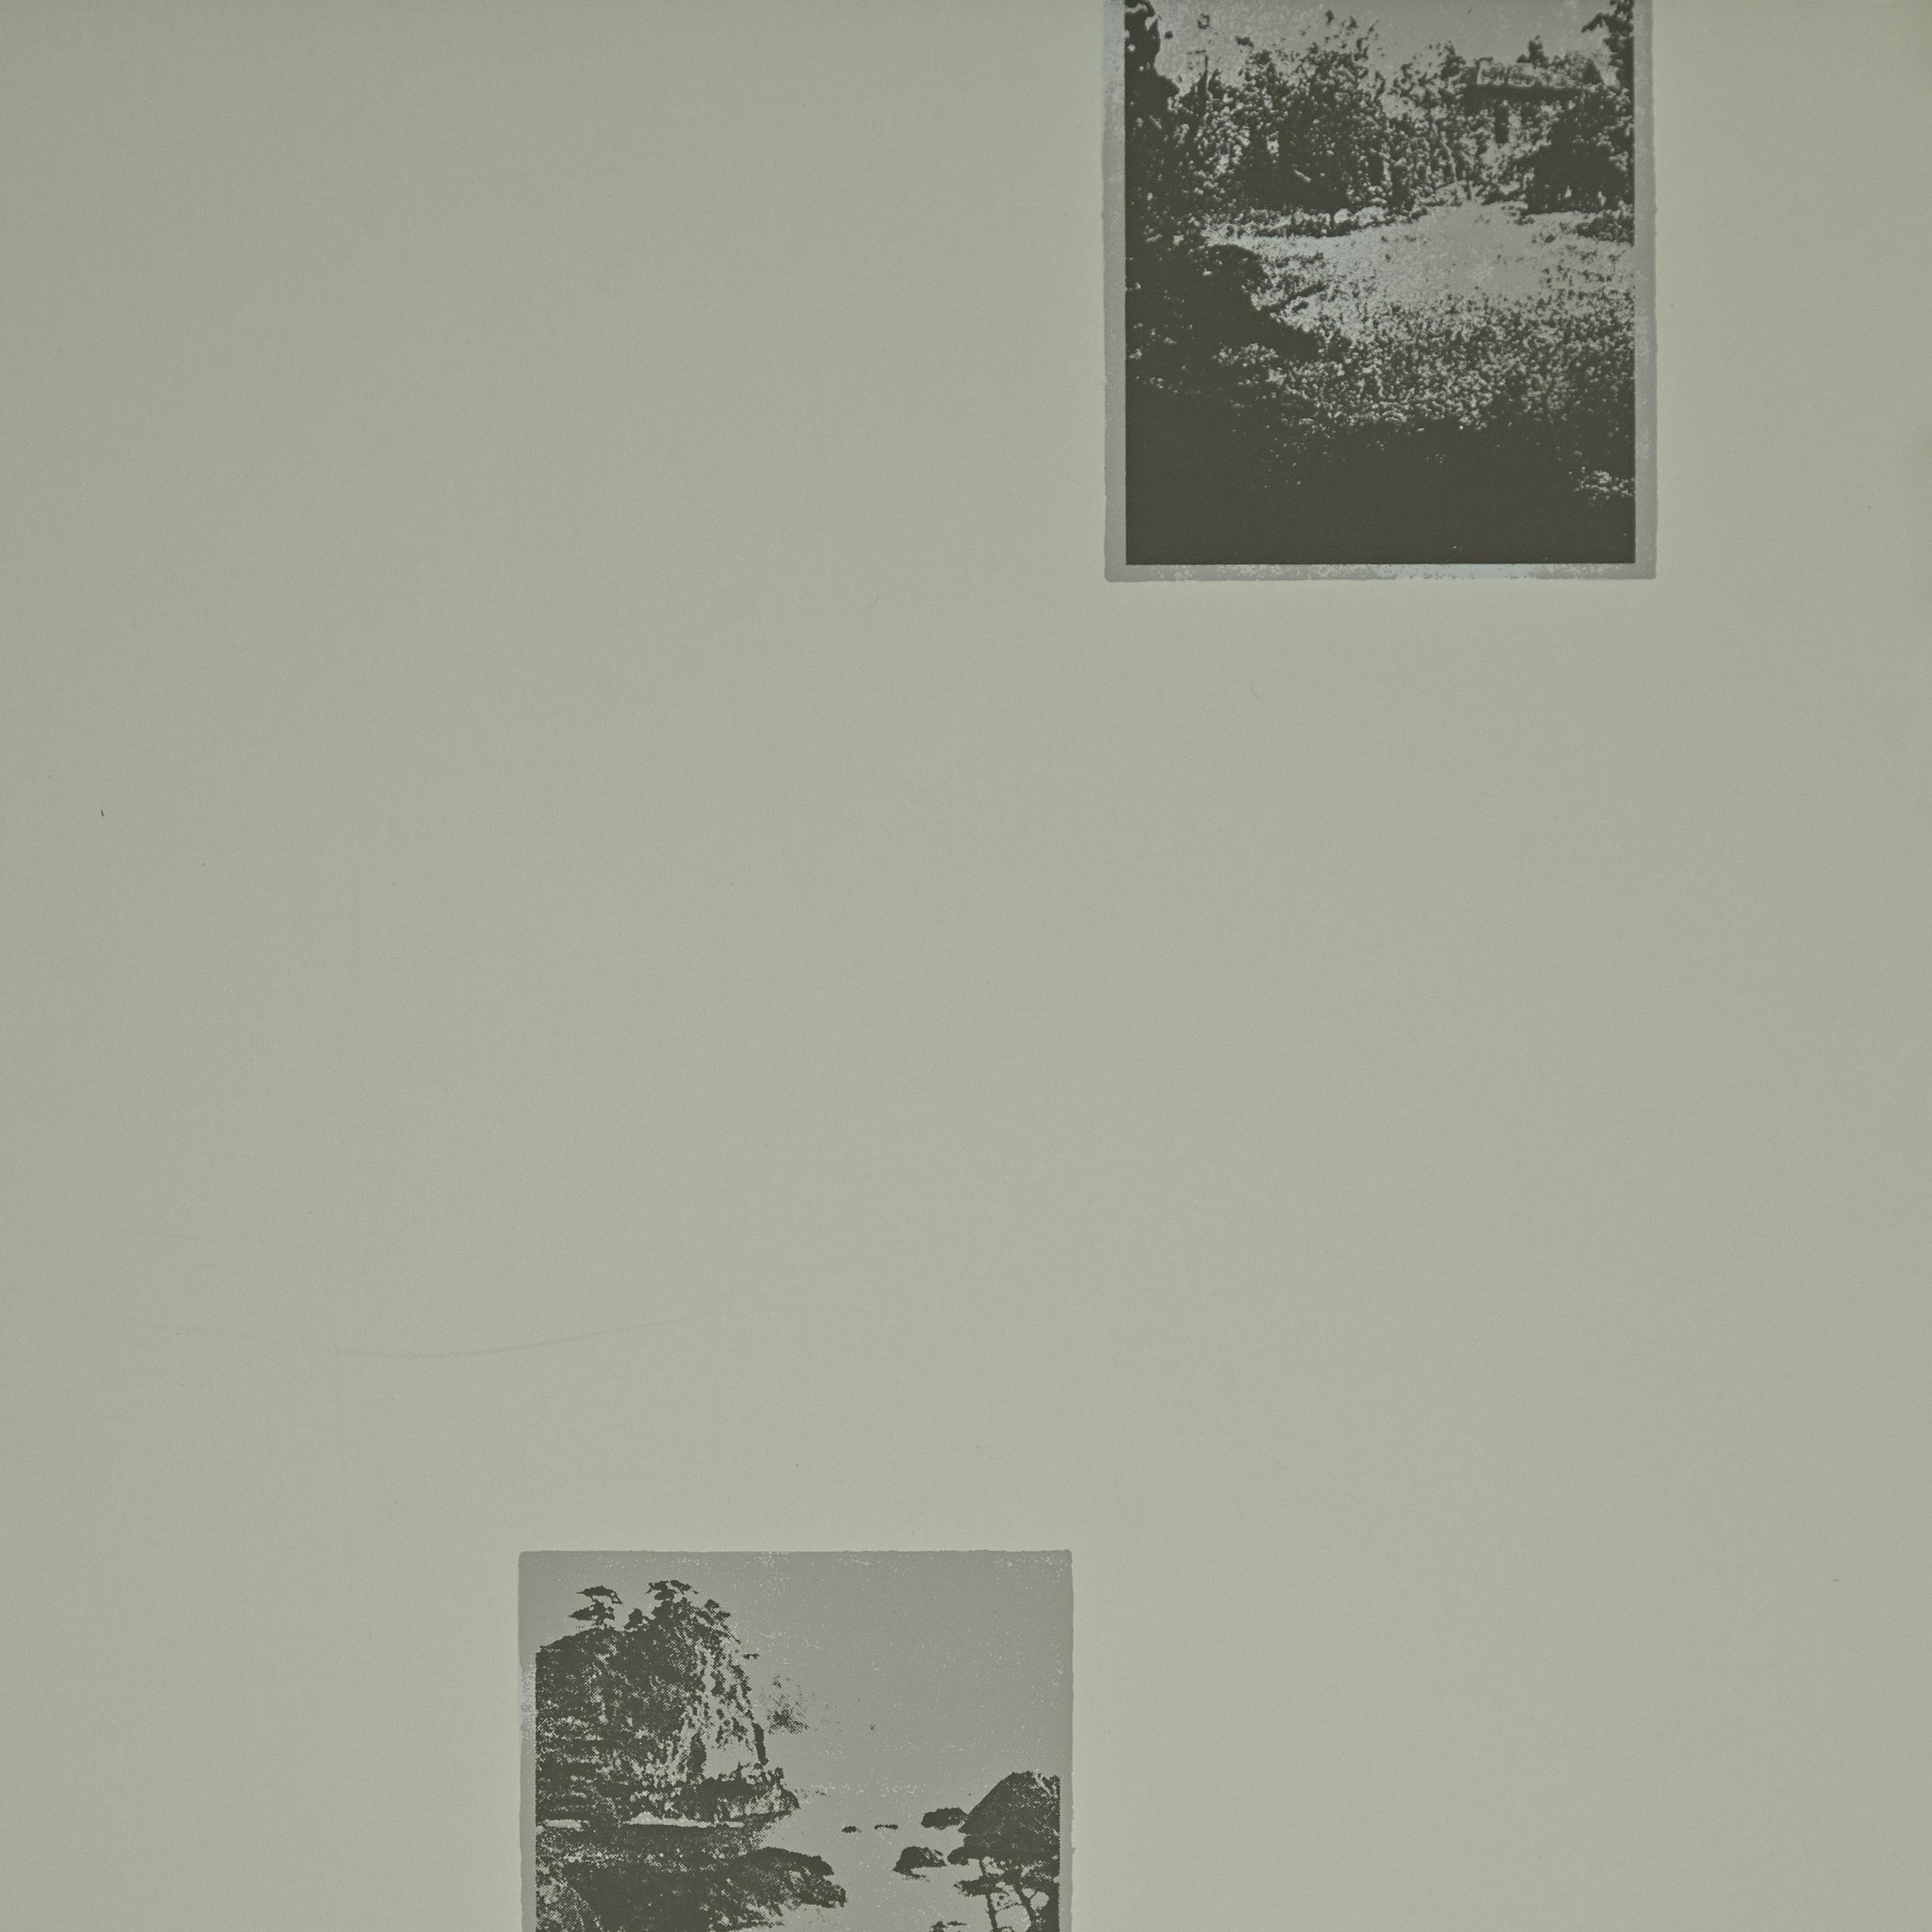 W19-04